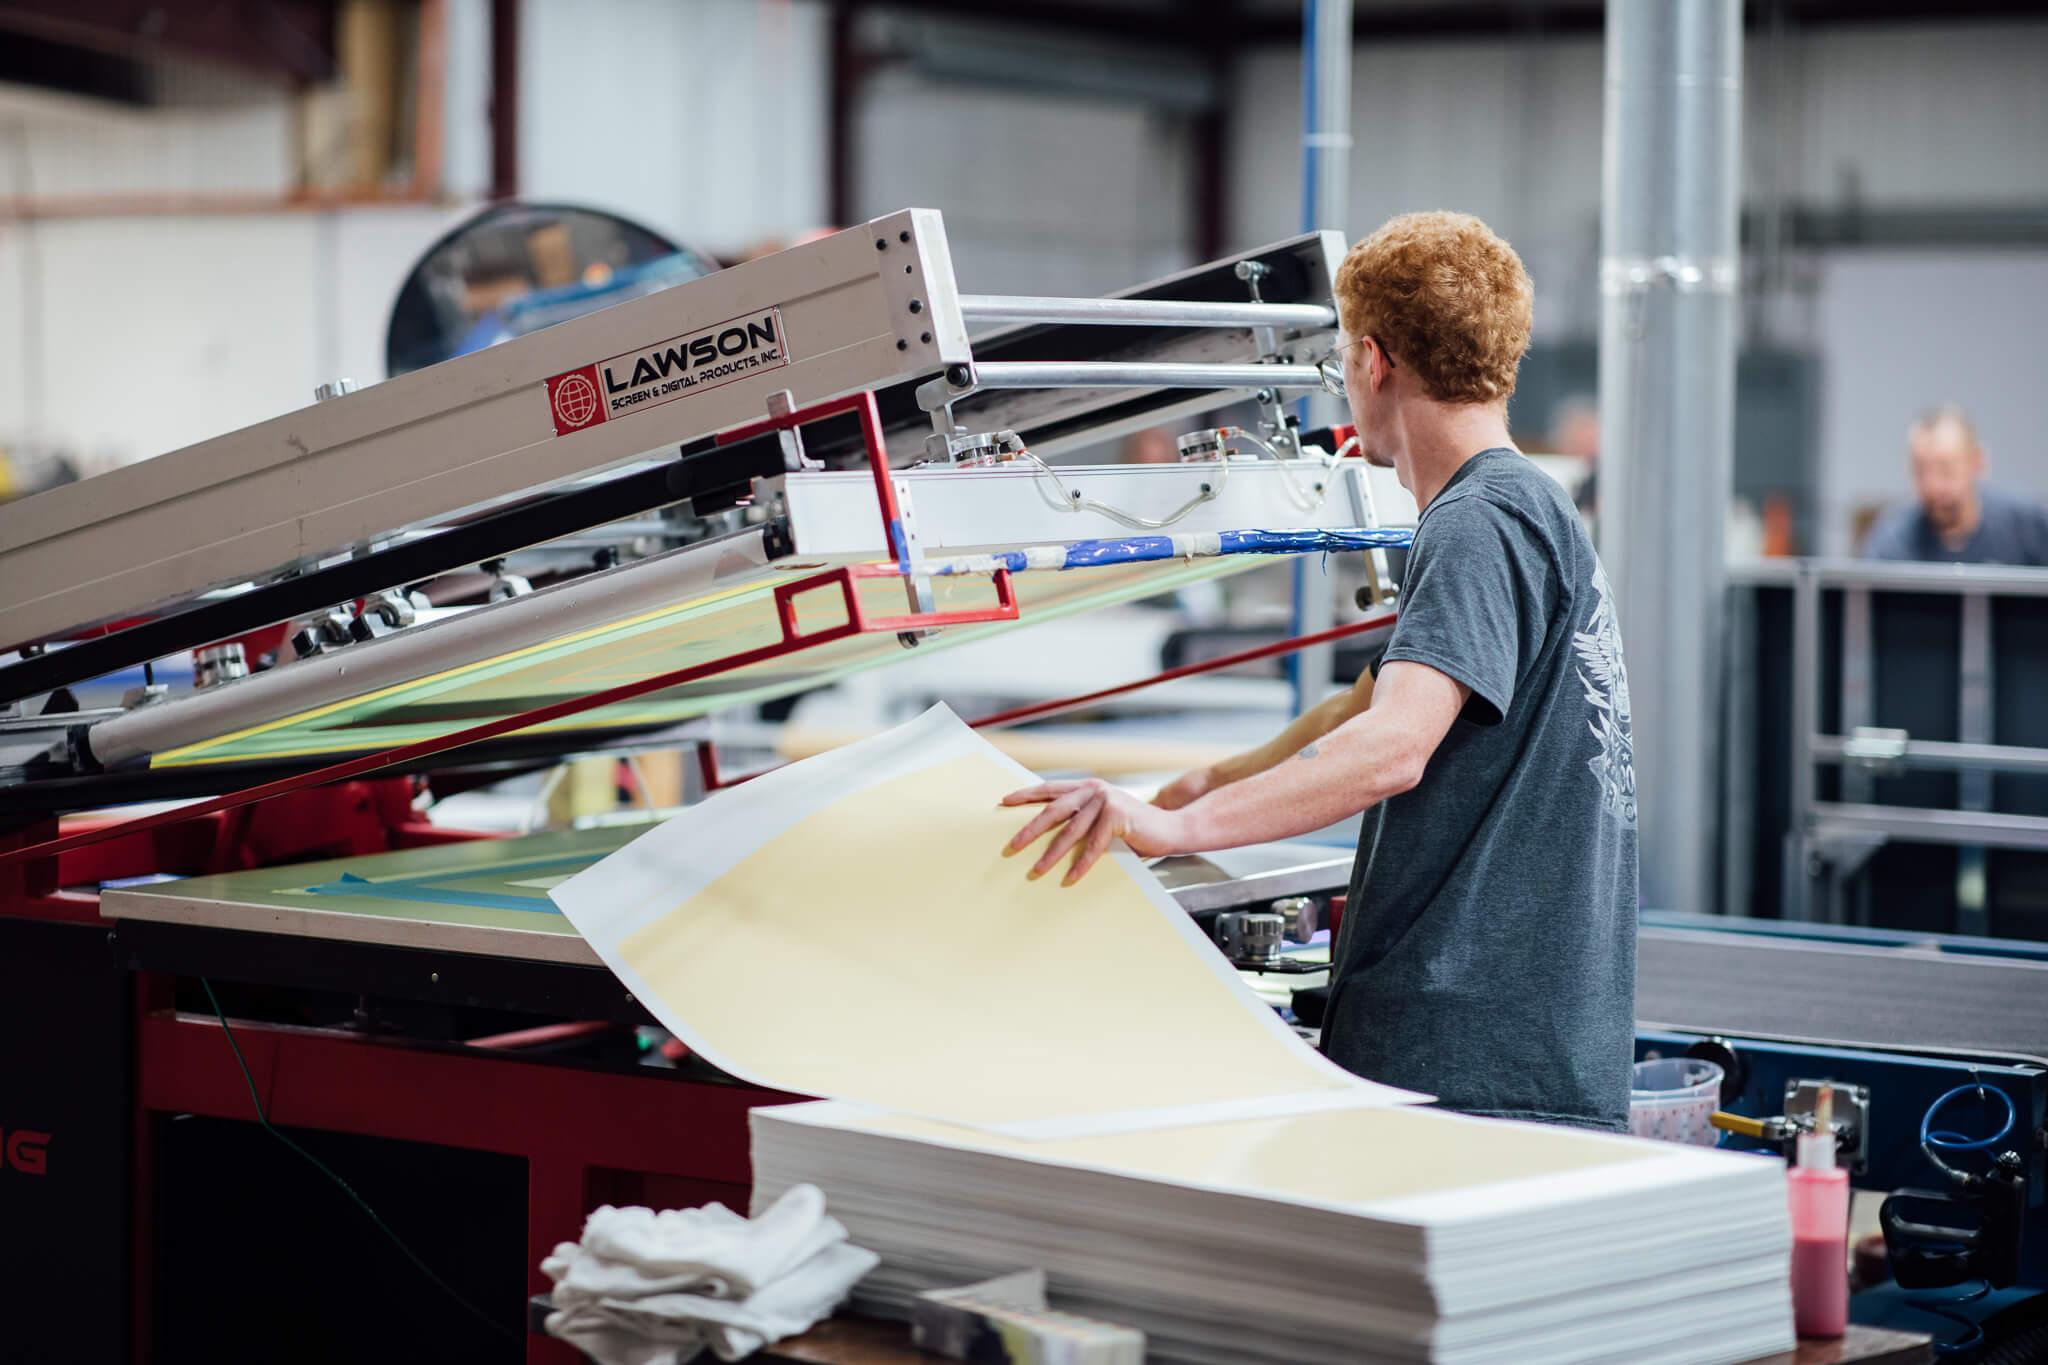 Medium shot of a man screen printing vinyl decals. Photo was taken for the Go Decals website redesign.